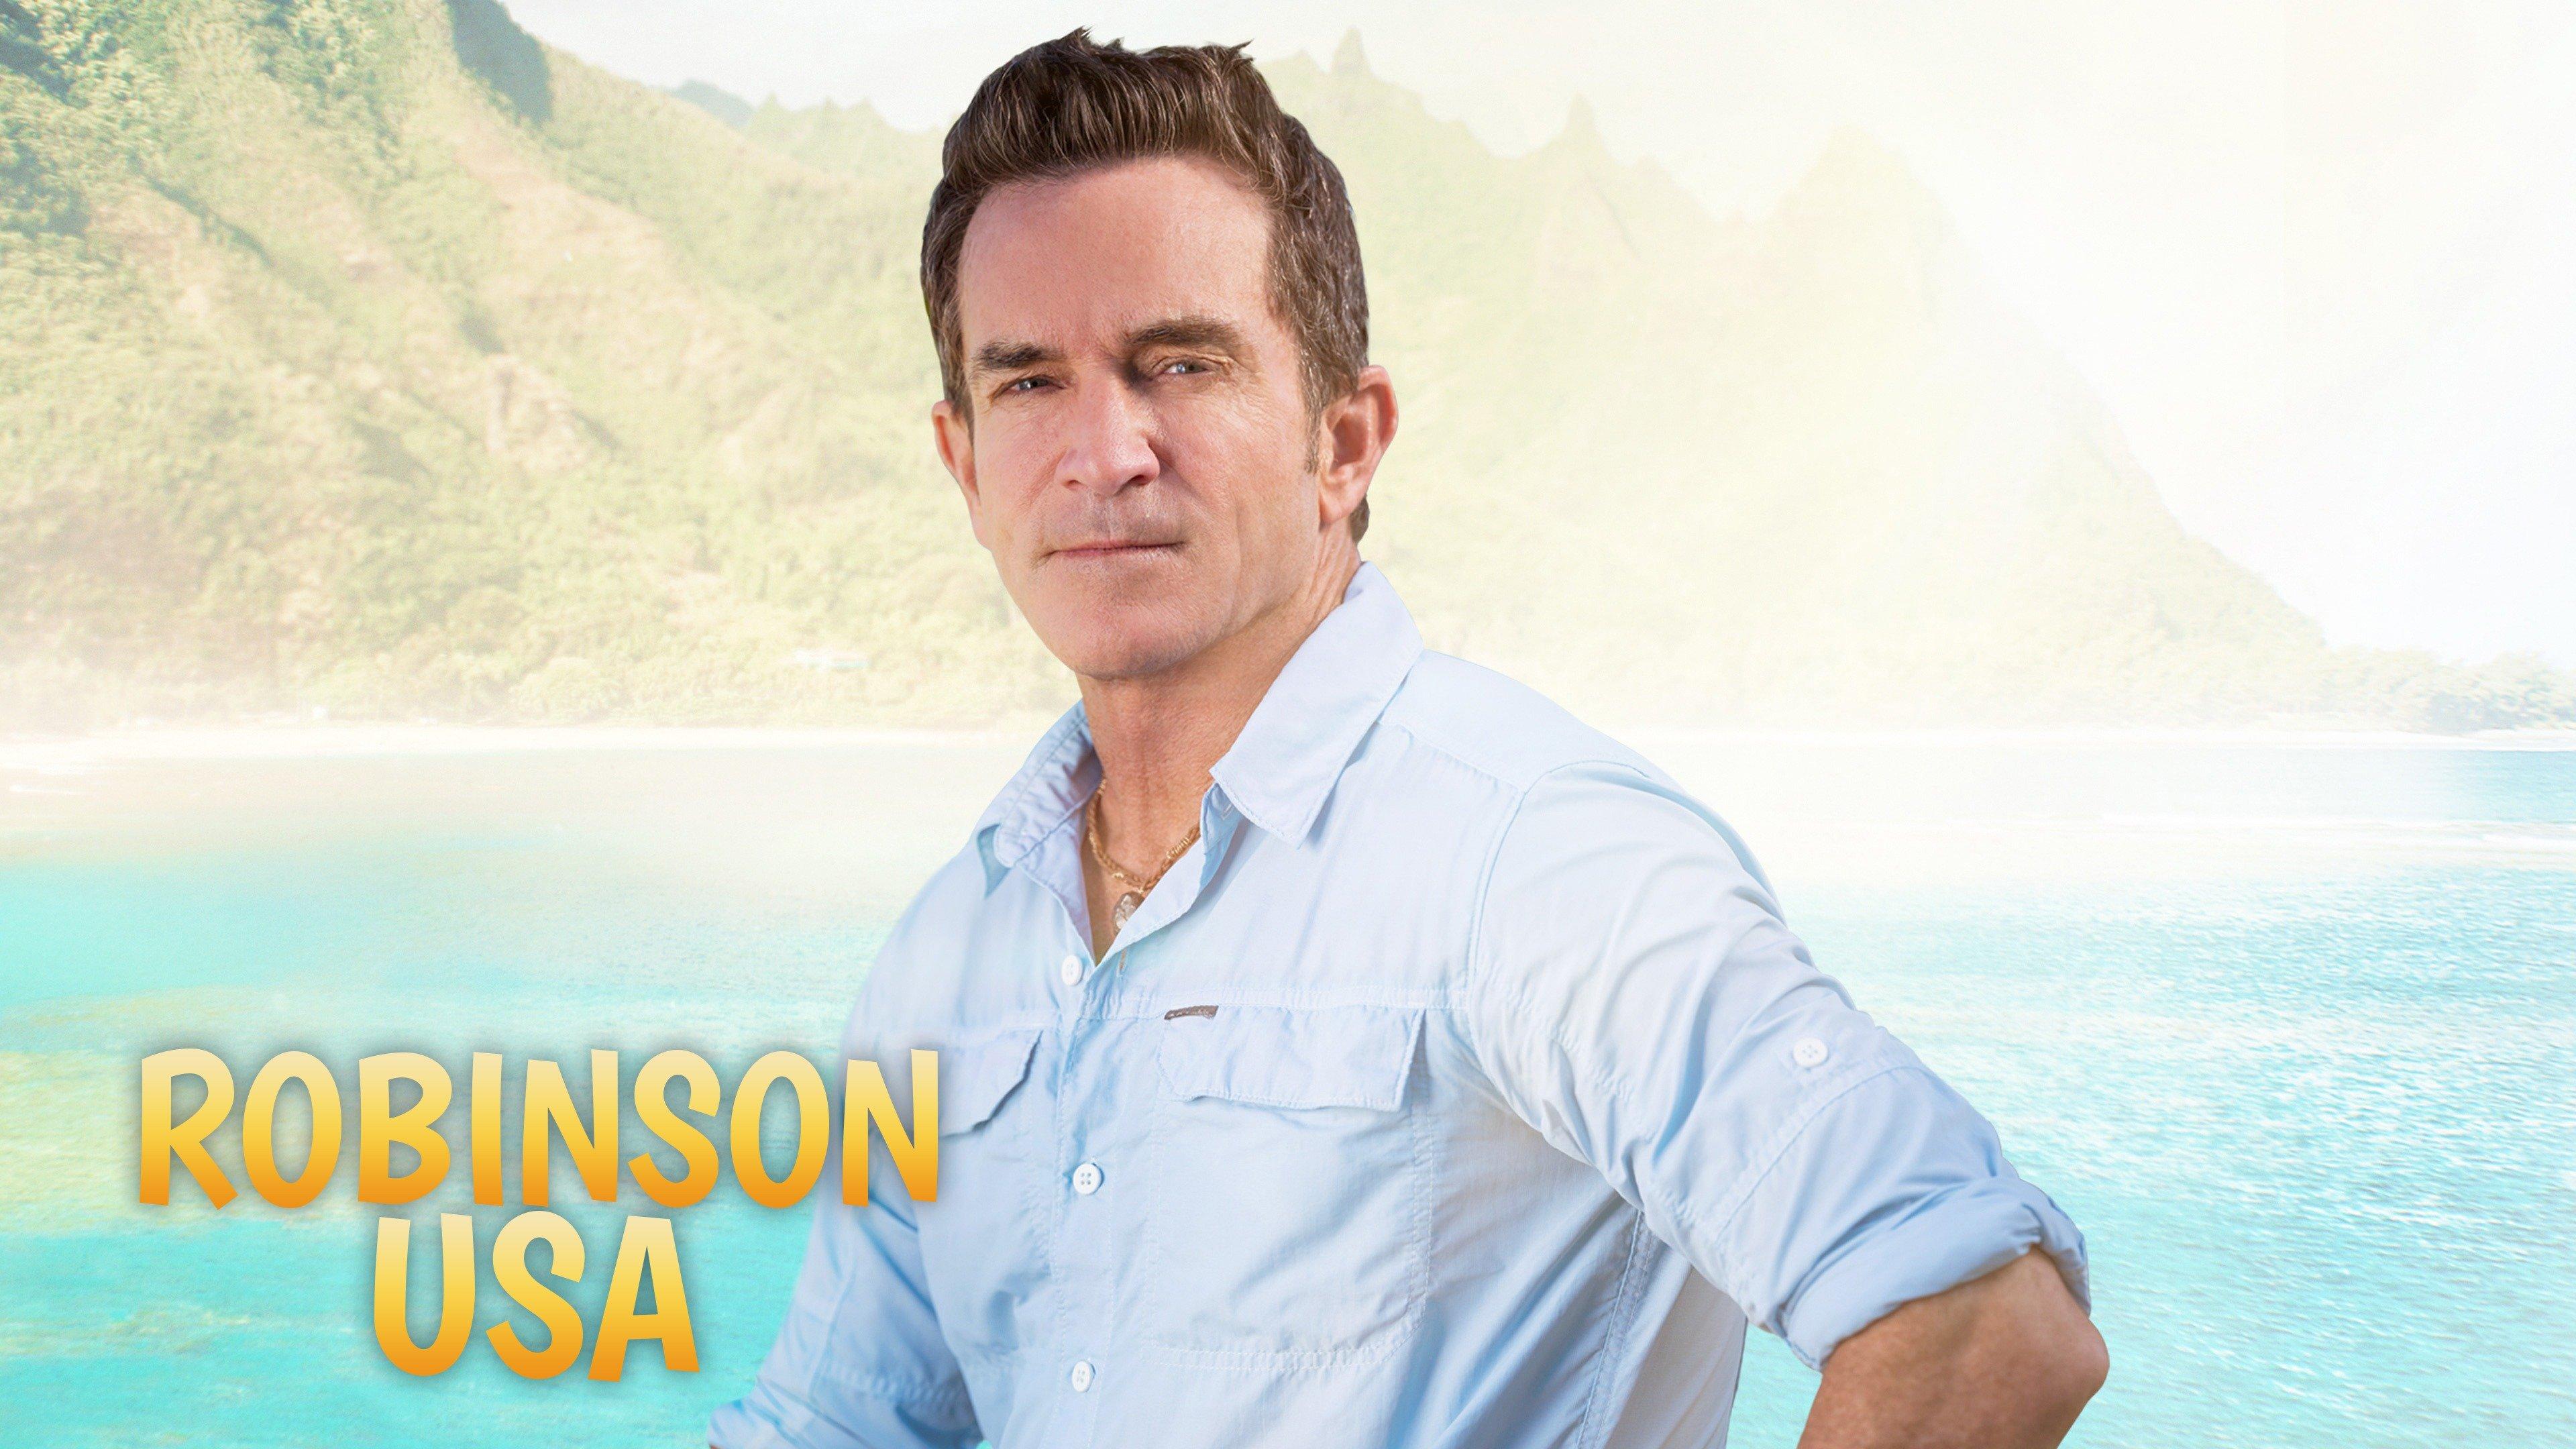 Robinson USA